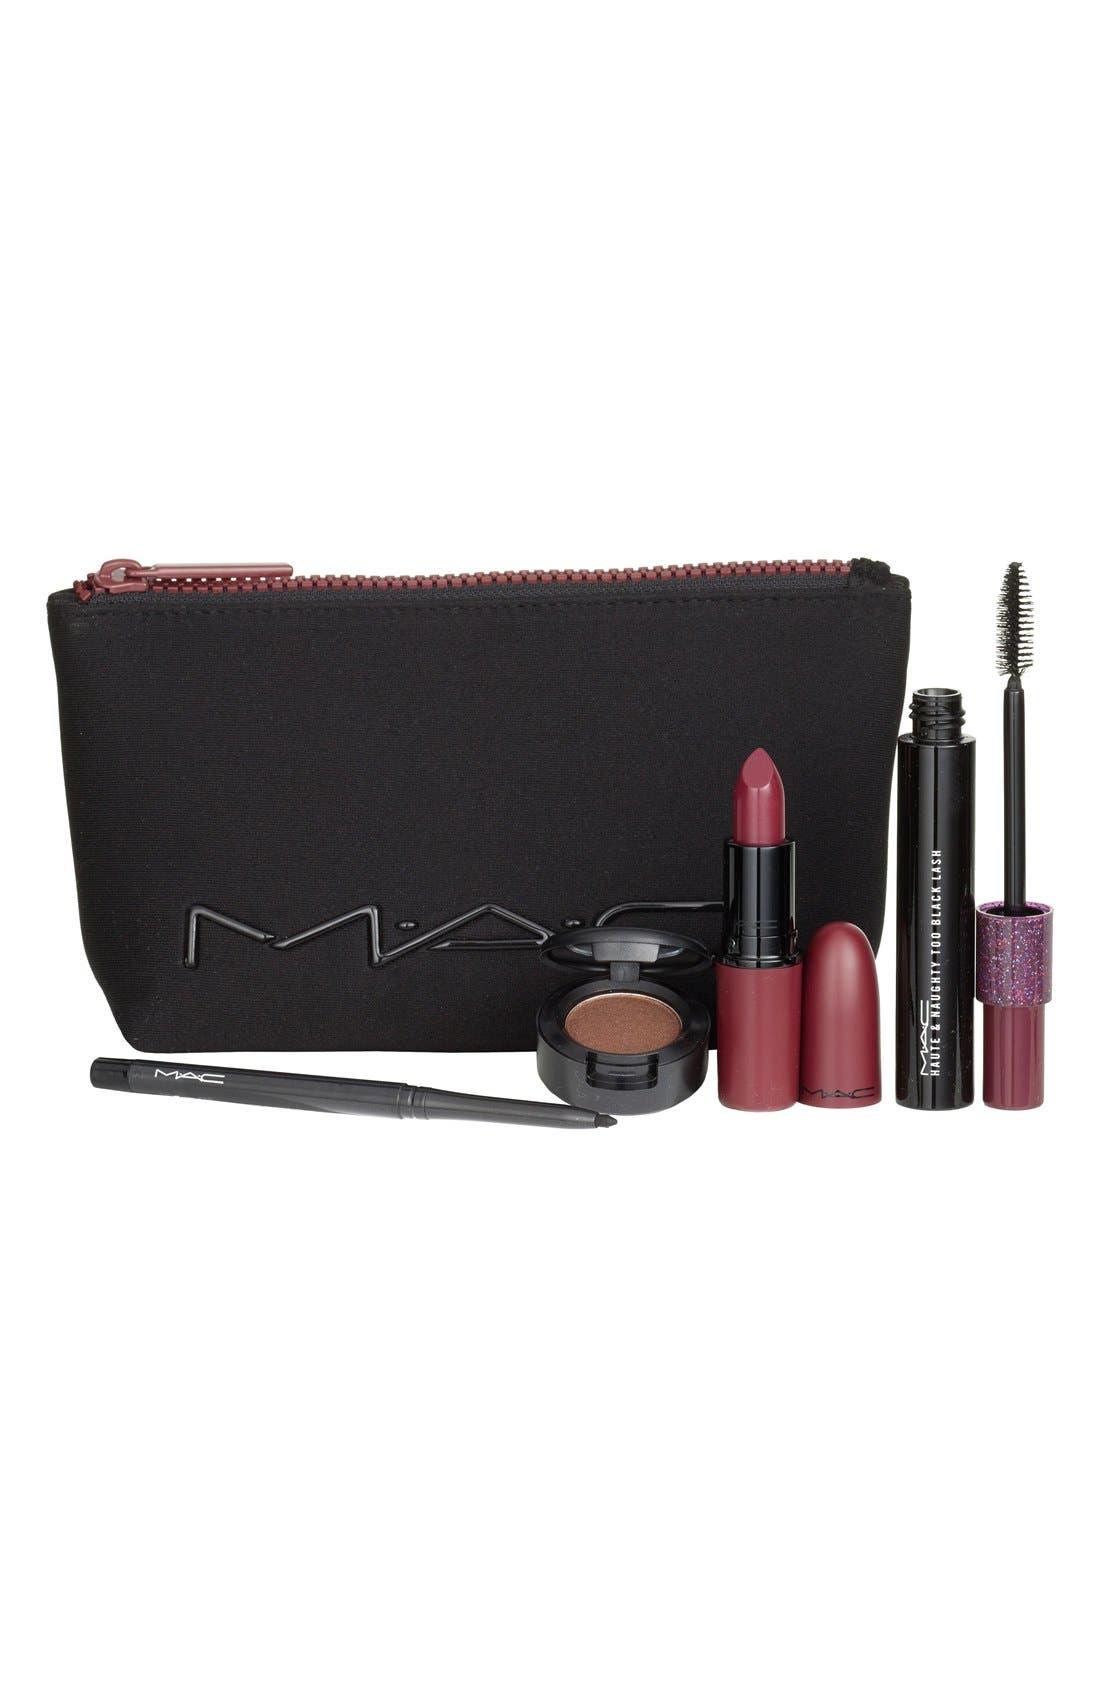 MAC 'Look in a Box - Sassy Siren' Burgundy Lip & Eye Kit,                             Main thumbnail 1, color,                             000